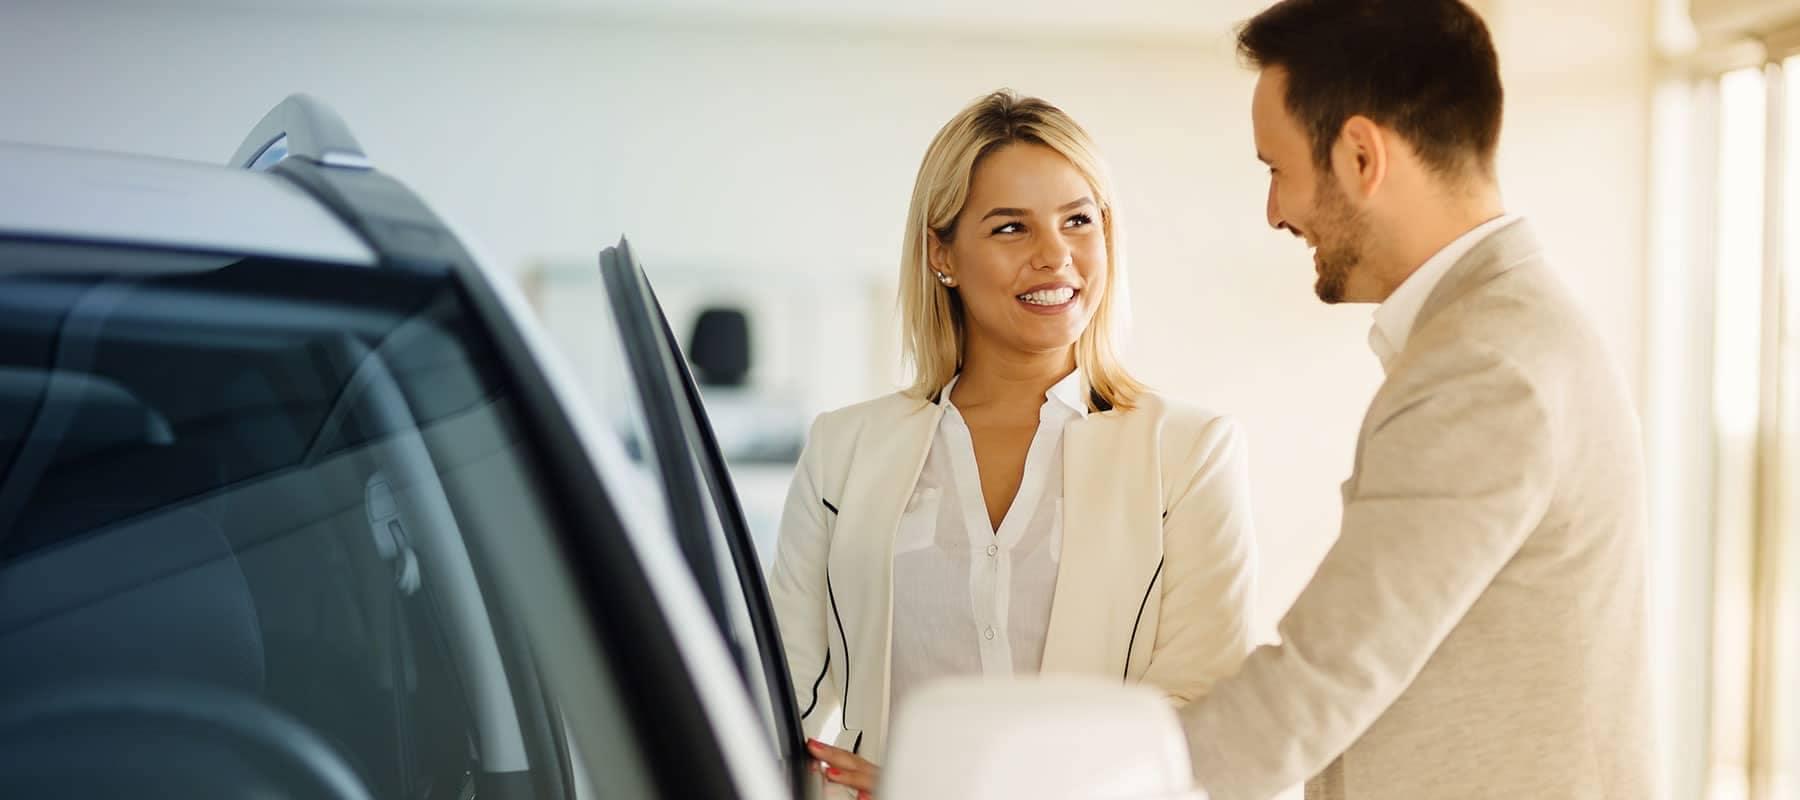 woman buying car from car salesman